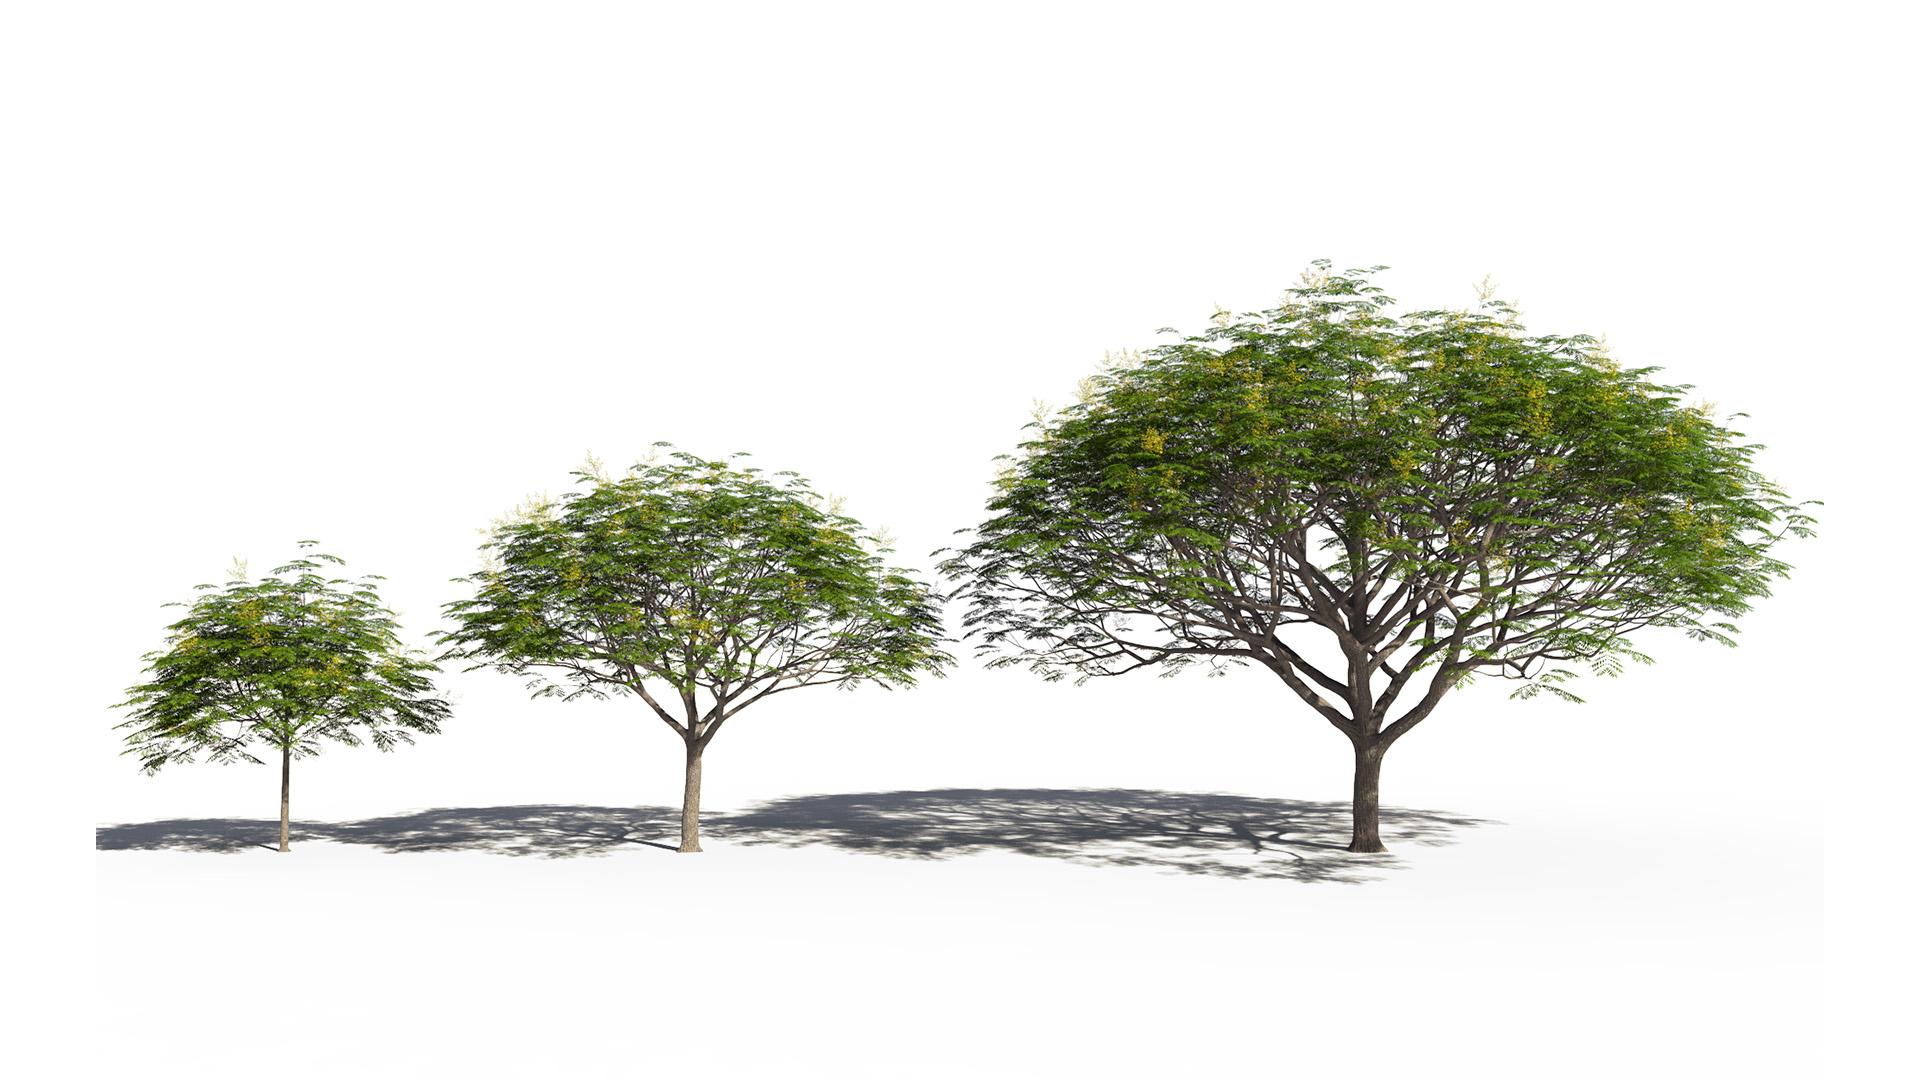 3D model of the Chinese flame tree Koelreuteria bipinnata maturity variations